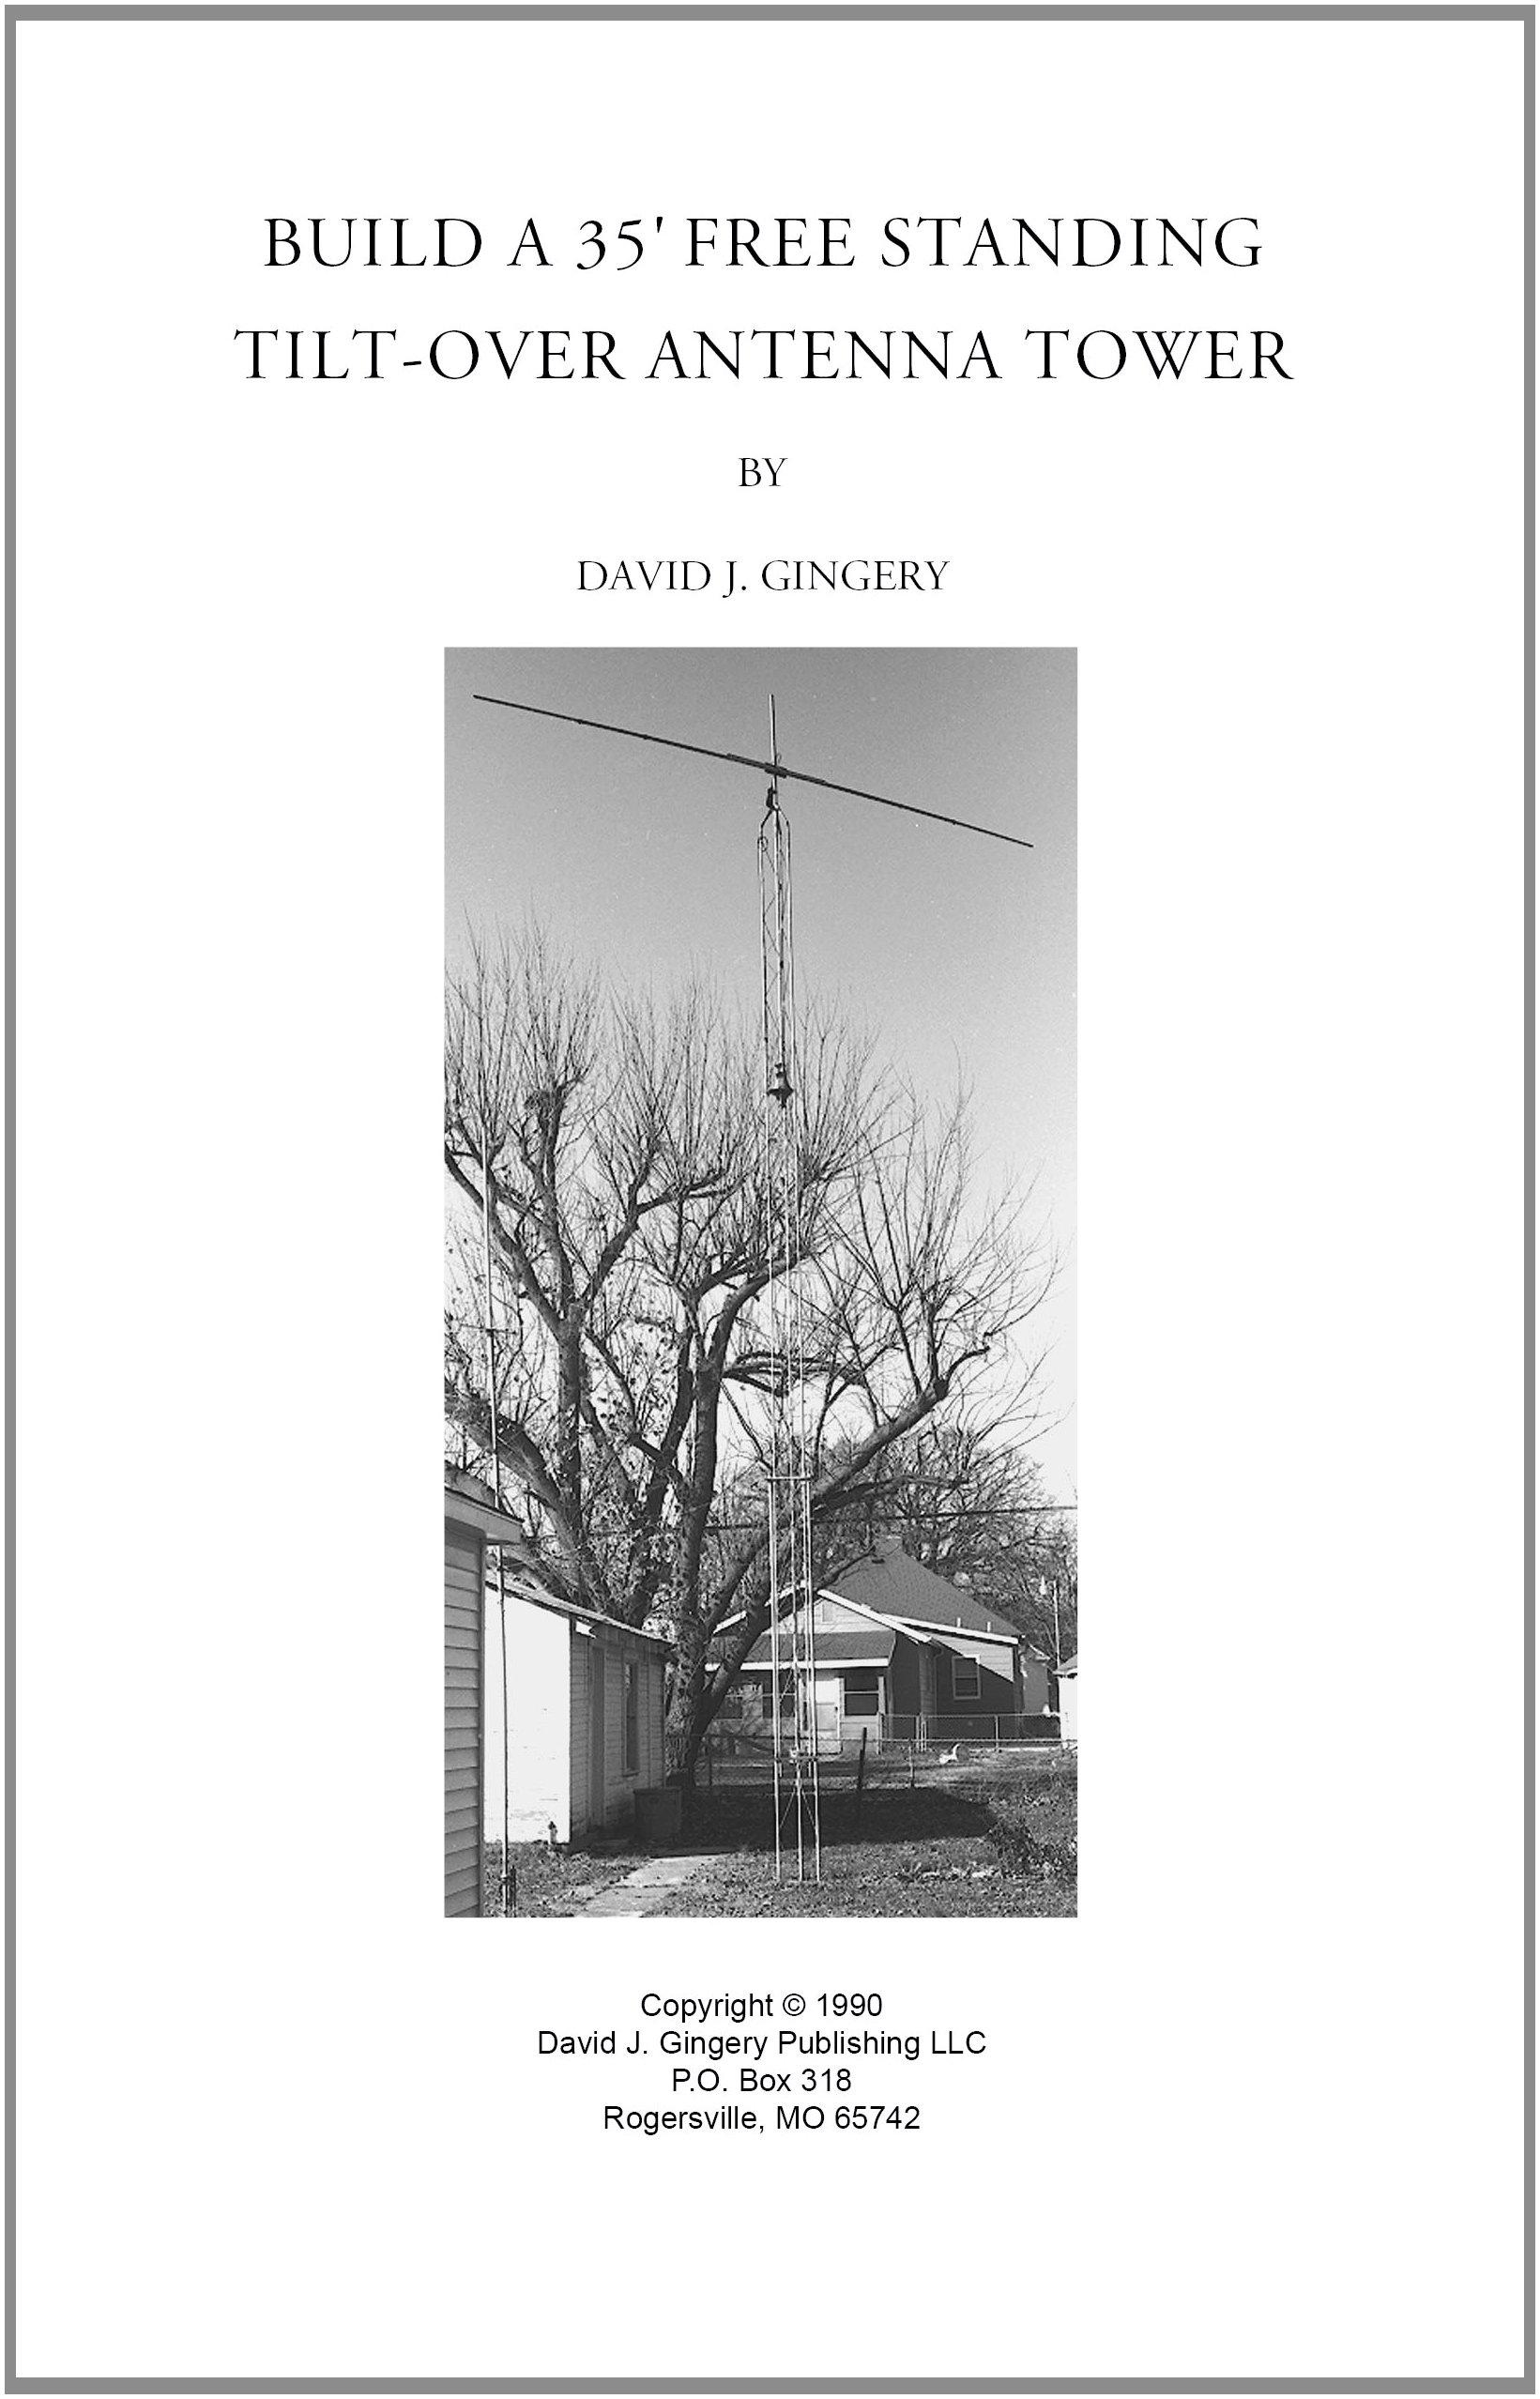 Build a 35' Free Standing Tilt-Over Antenna Tower: David